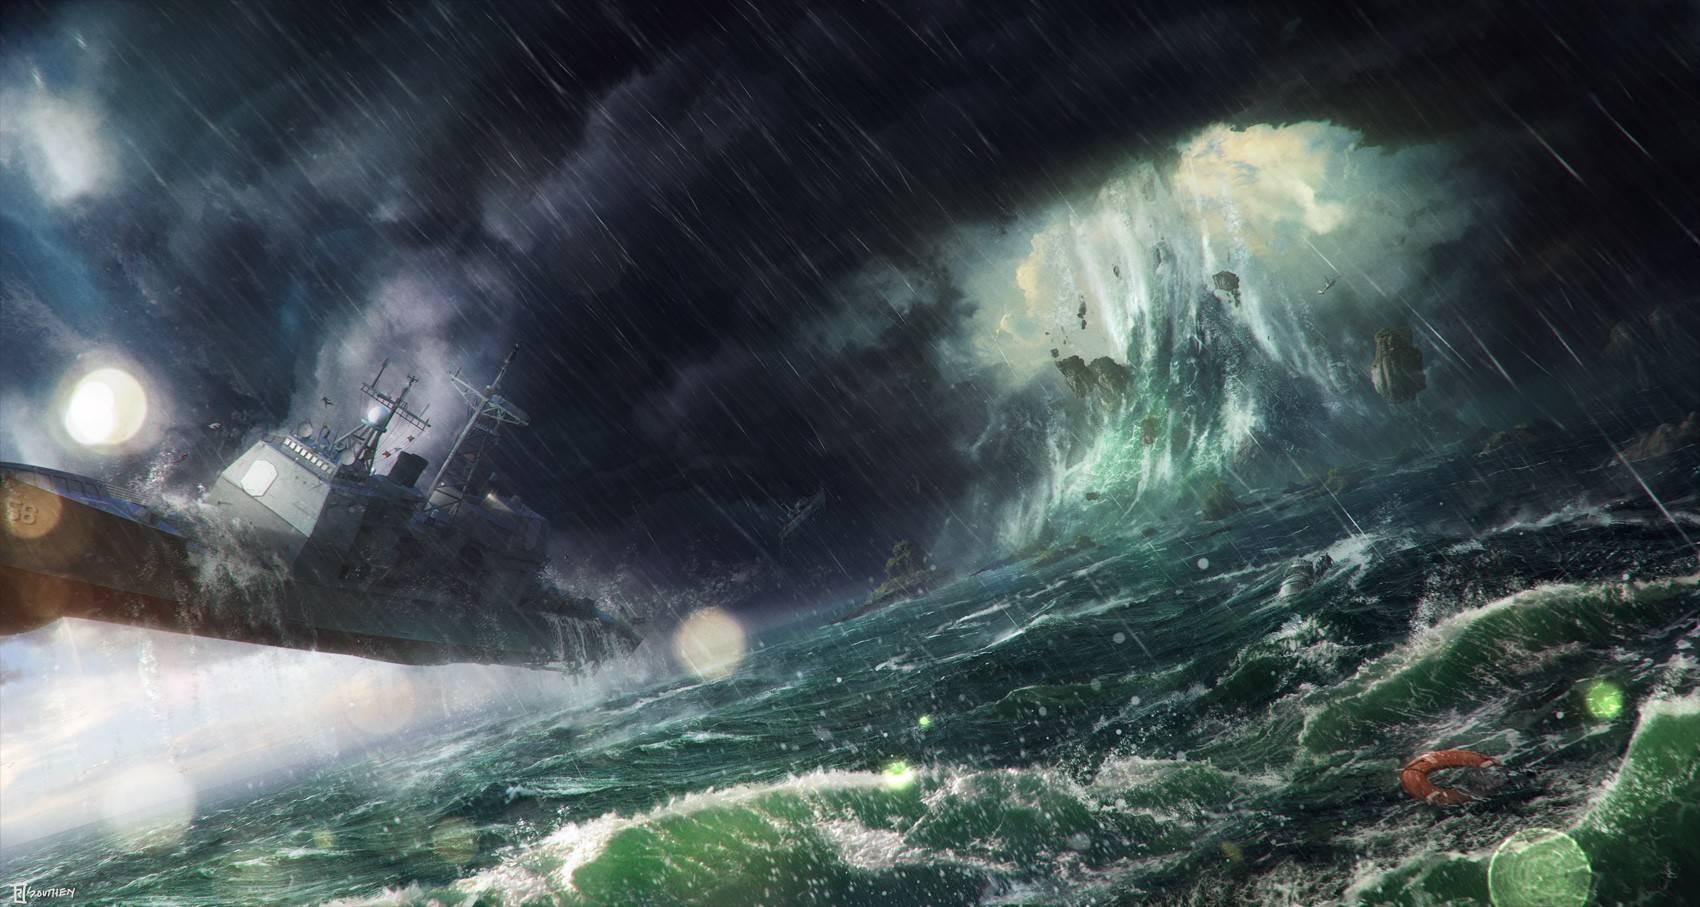 Ocean Storm 1700907 Wallpaper 2170279 1700x907